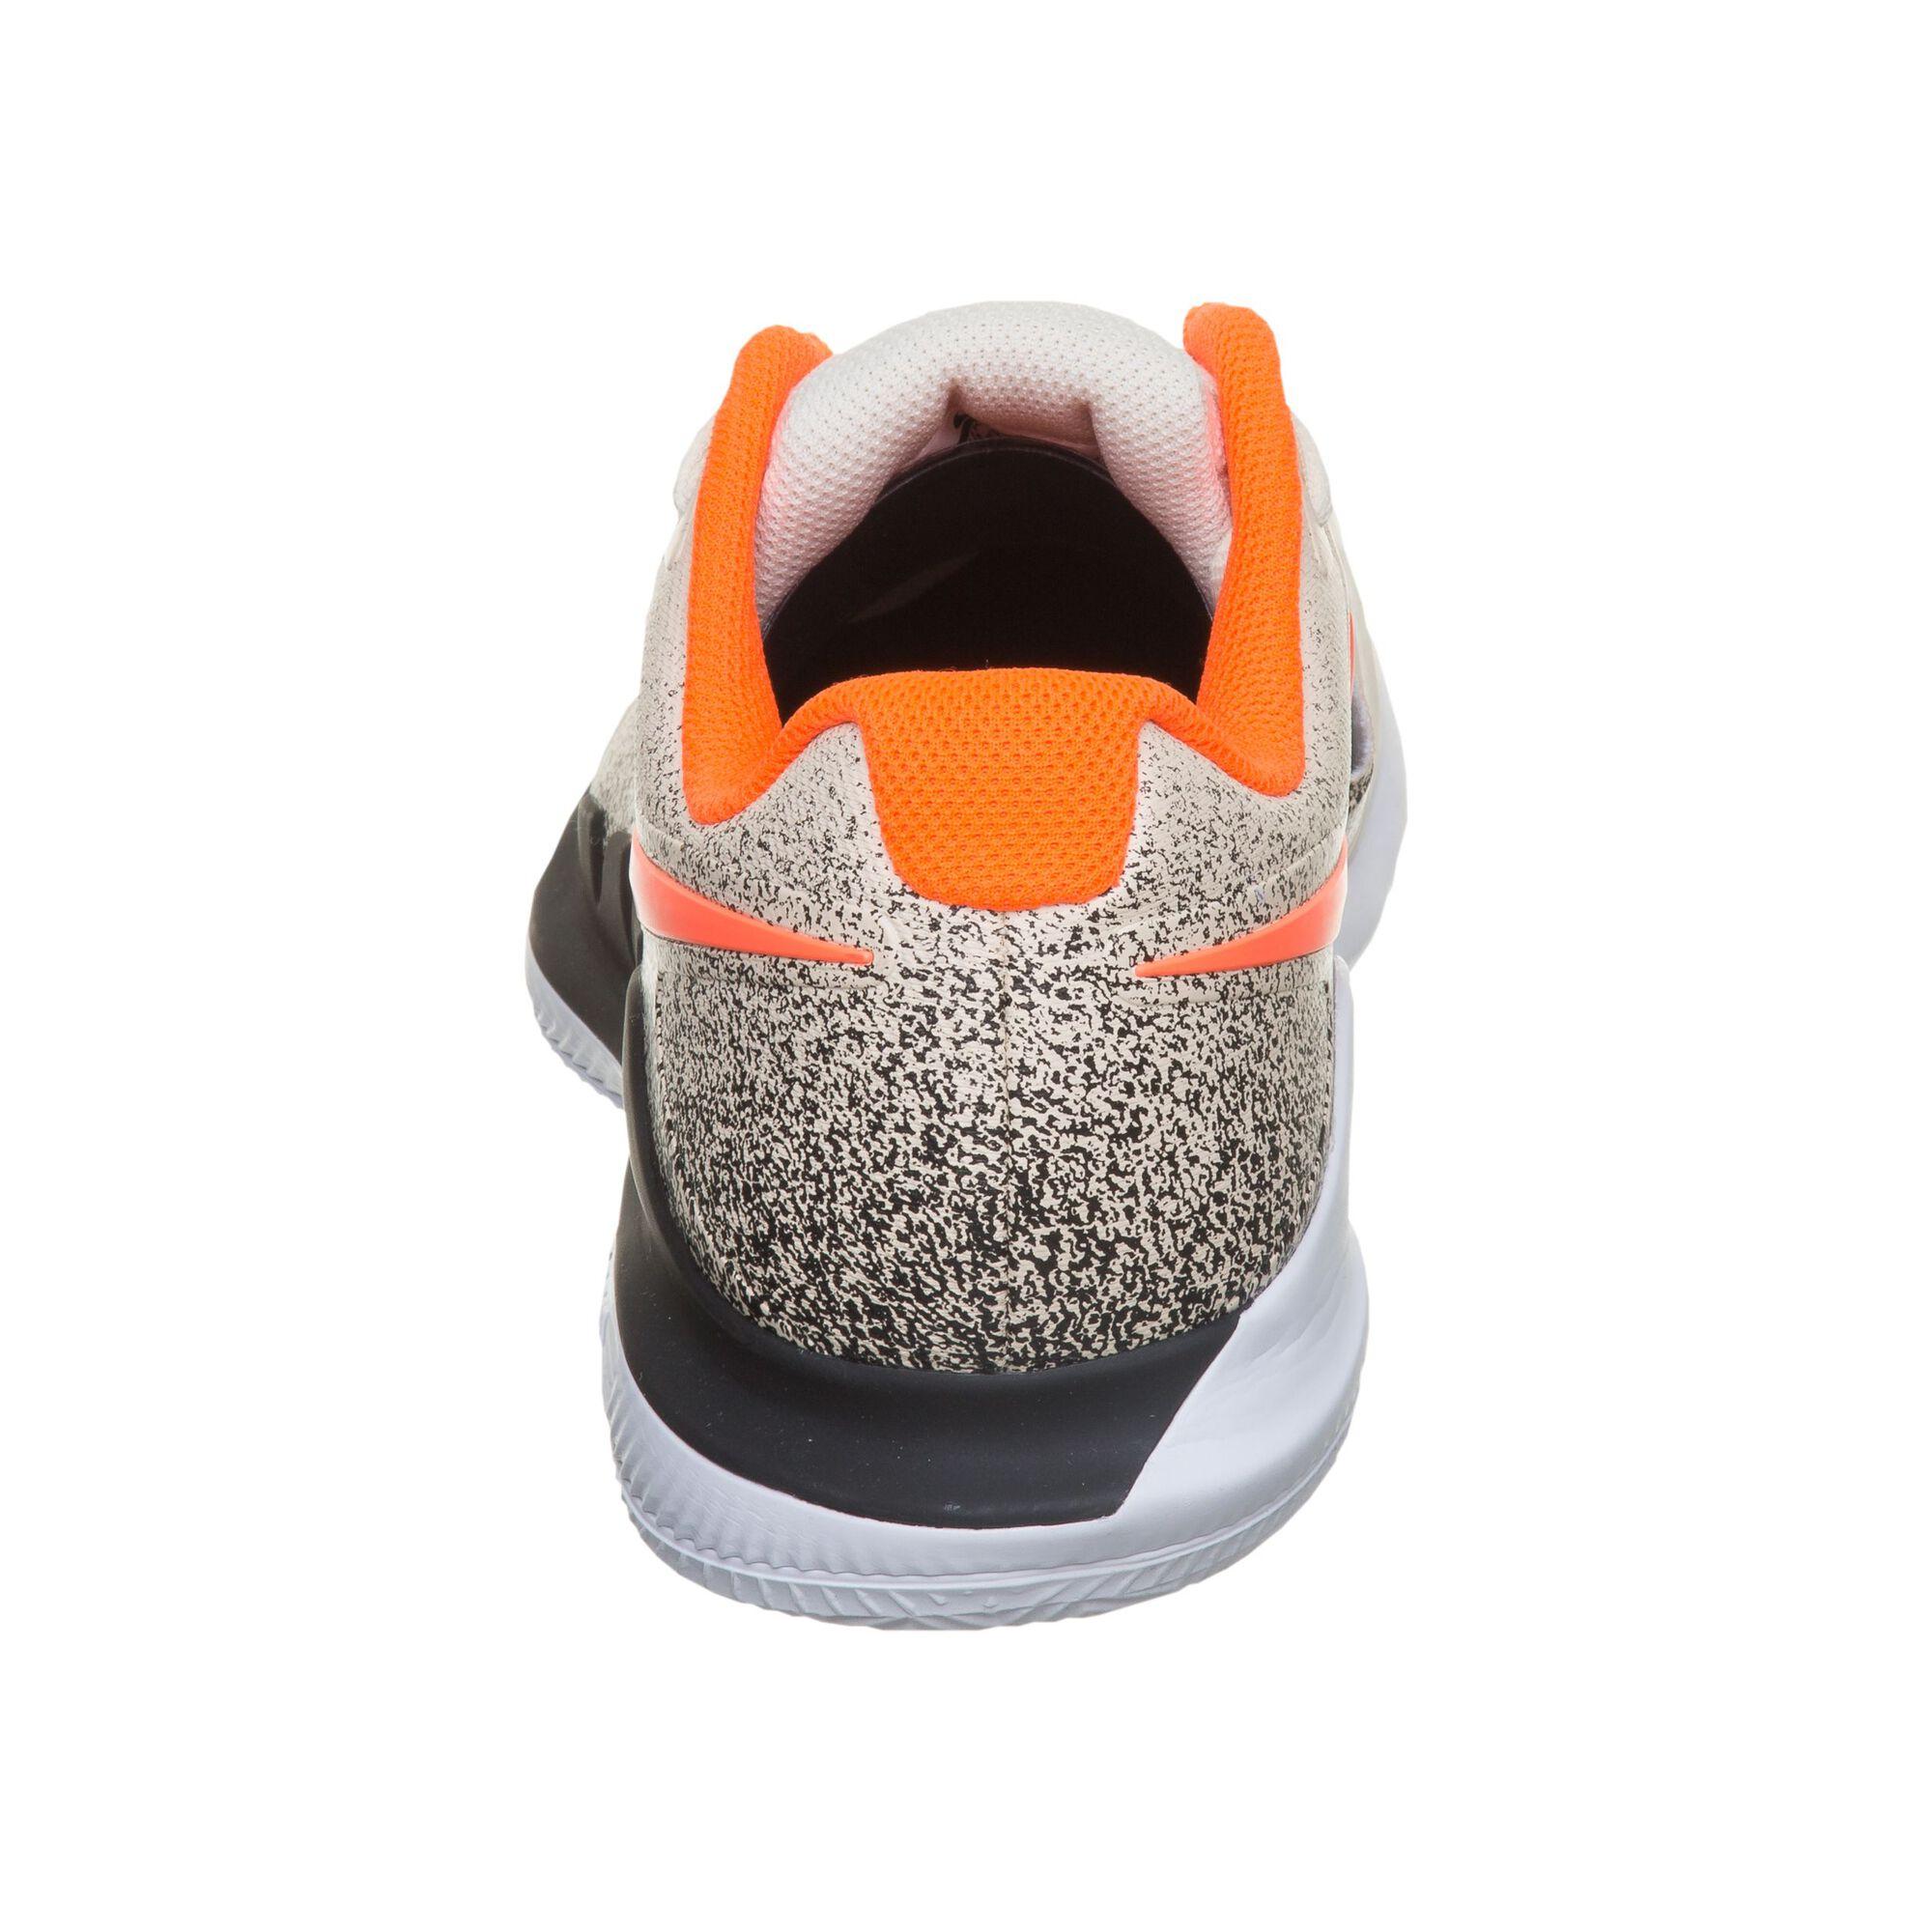 4290b1cc2ef33 Nike Air Zoom Vapor X Clay Sko För Grus Herrar - Creme